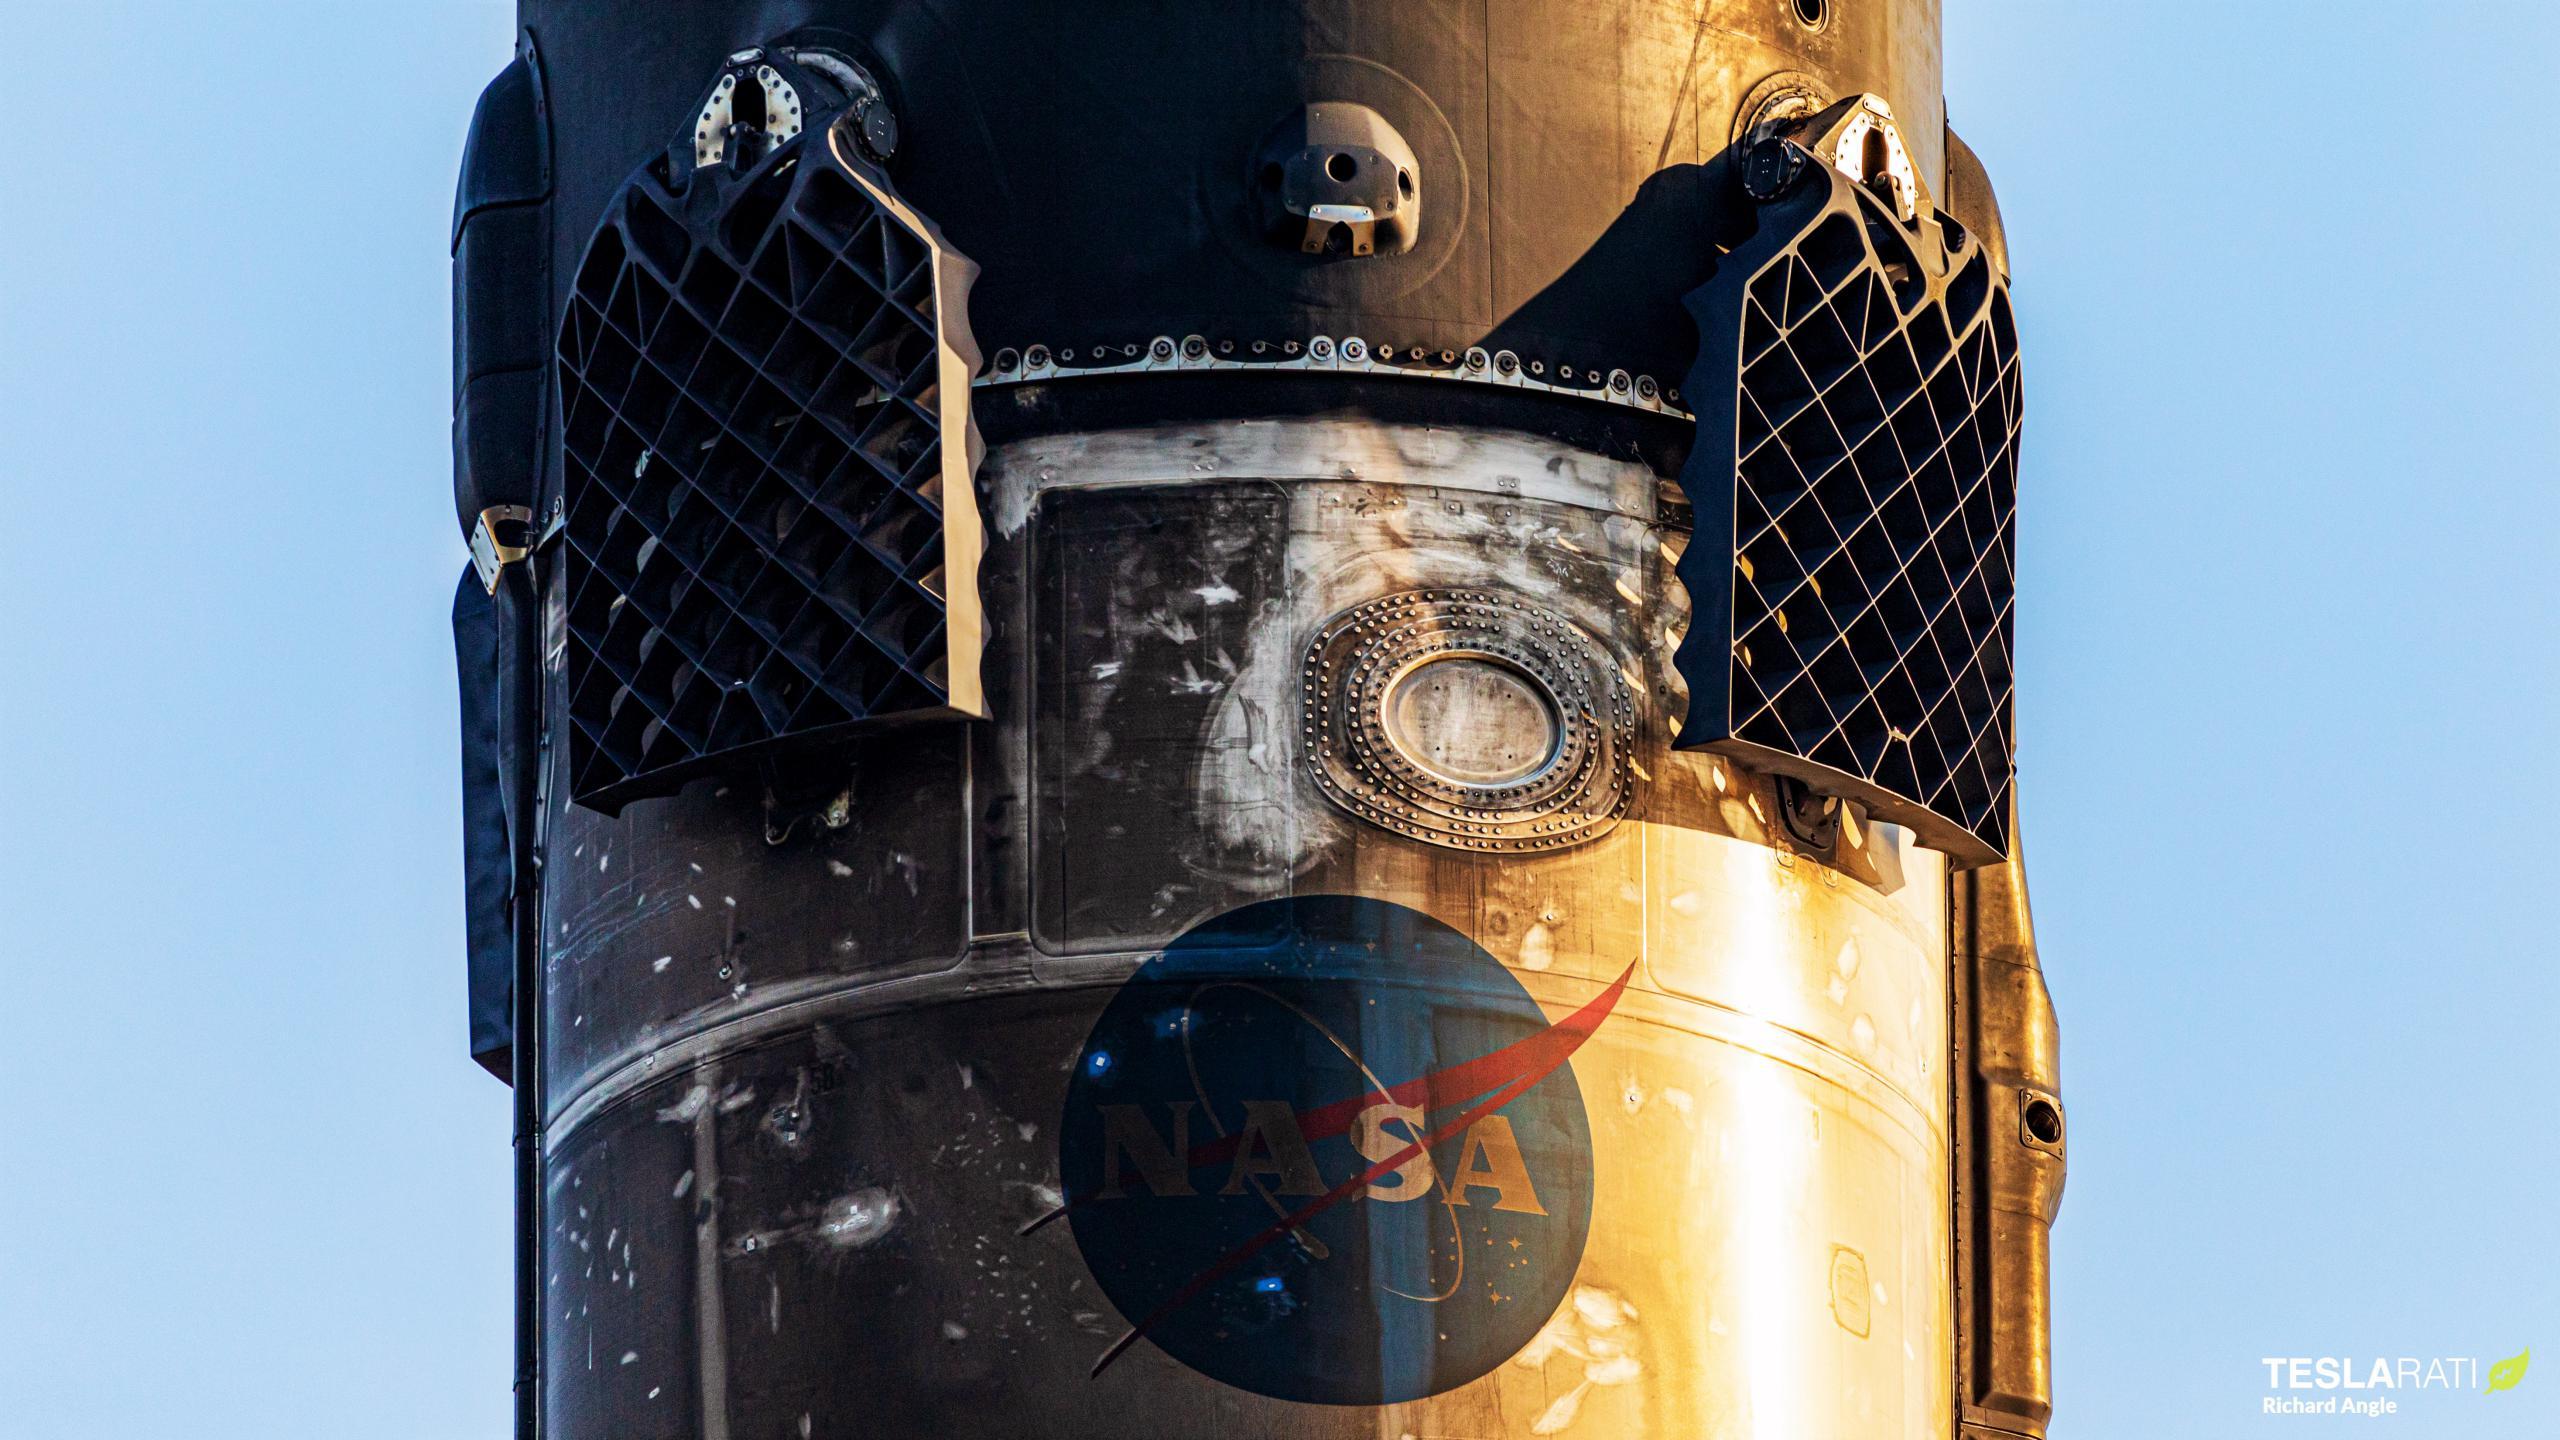 Starlink-23 Falcon 9 B1058 OCISLY return 041021 (Richard Angle) 9 crop 2 (c)